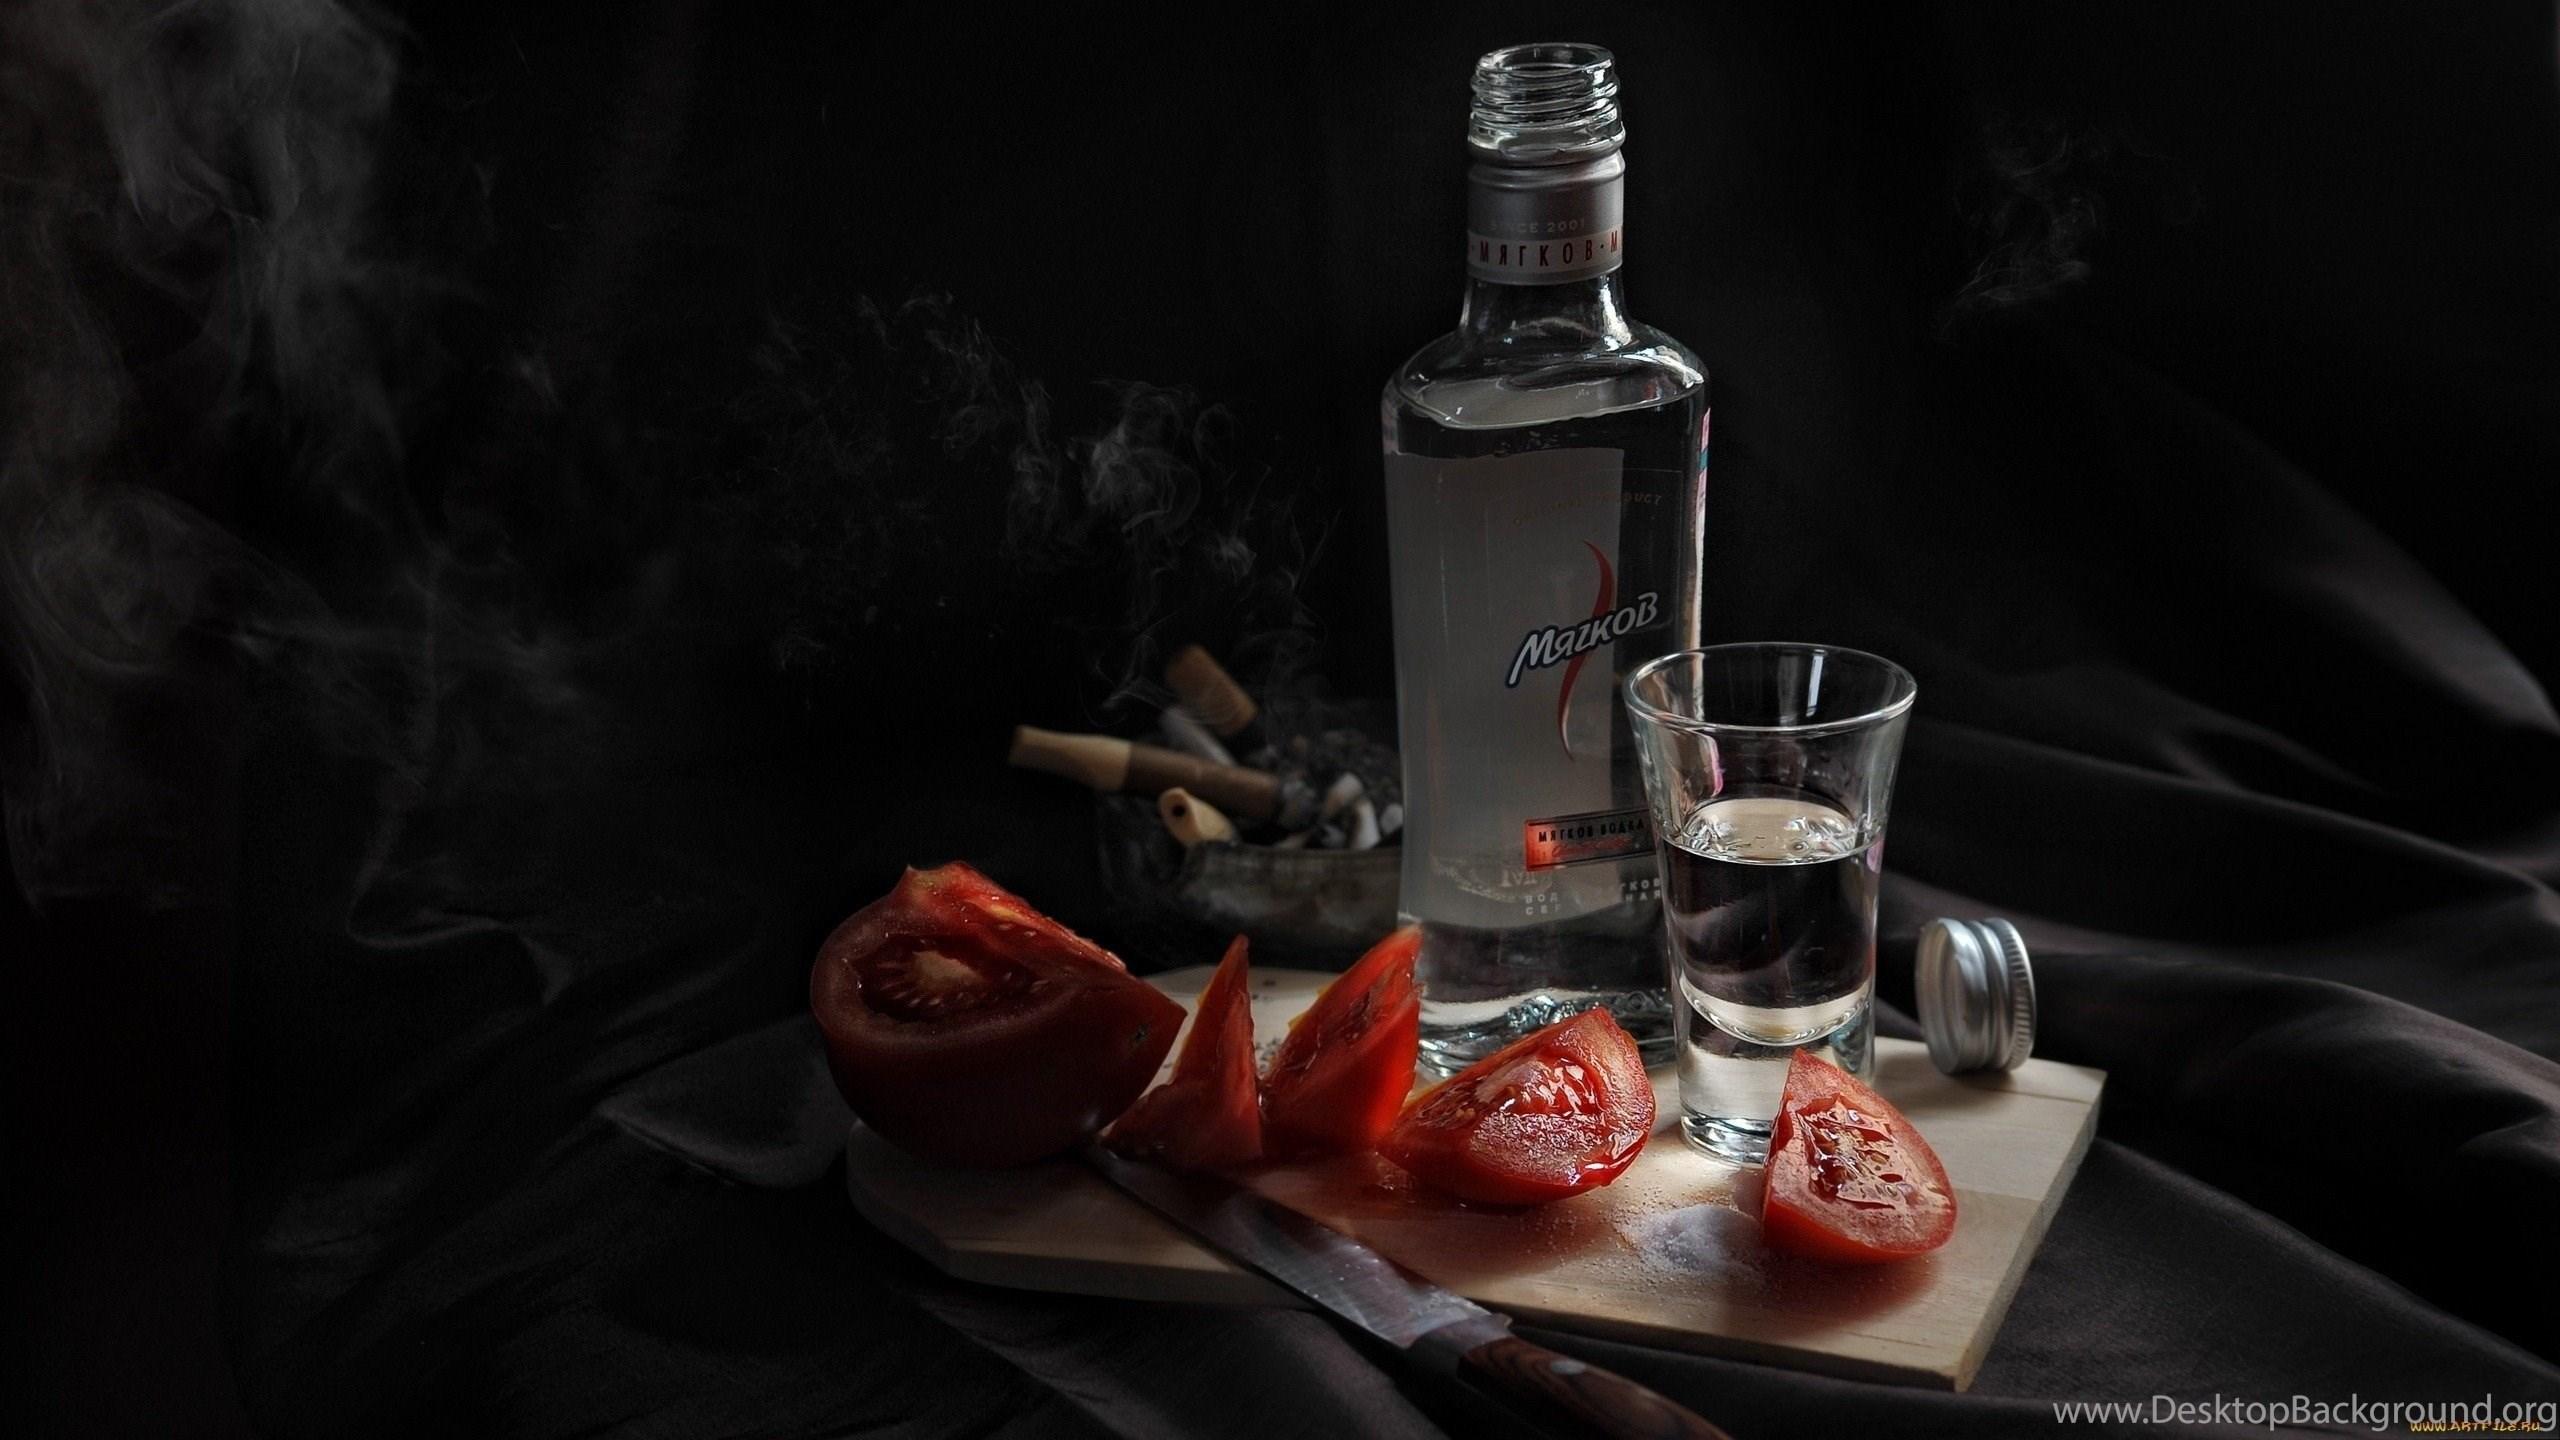 Smirnoff Vodka Food 2560x1440 Hd Wallpapers And Free Stock Photo Desktop Background